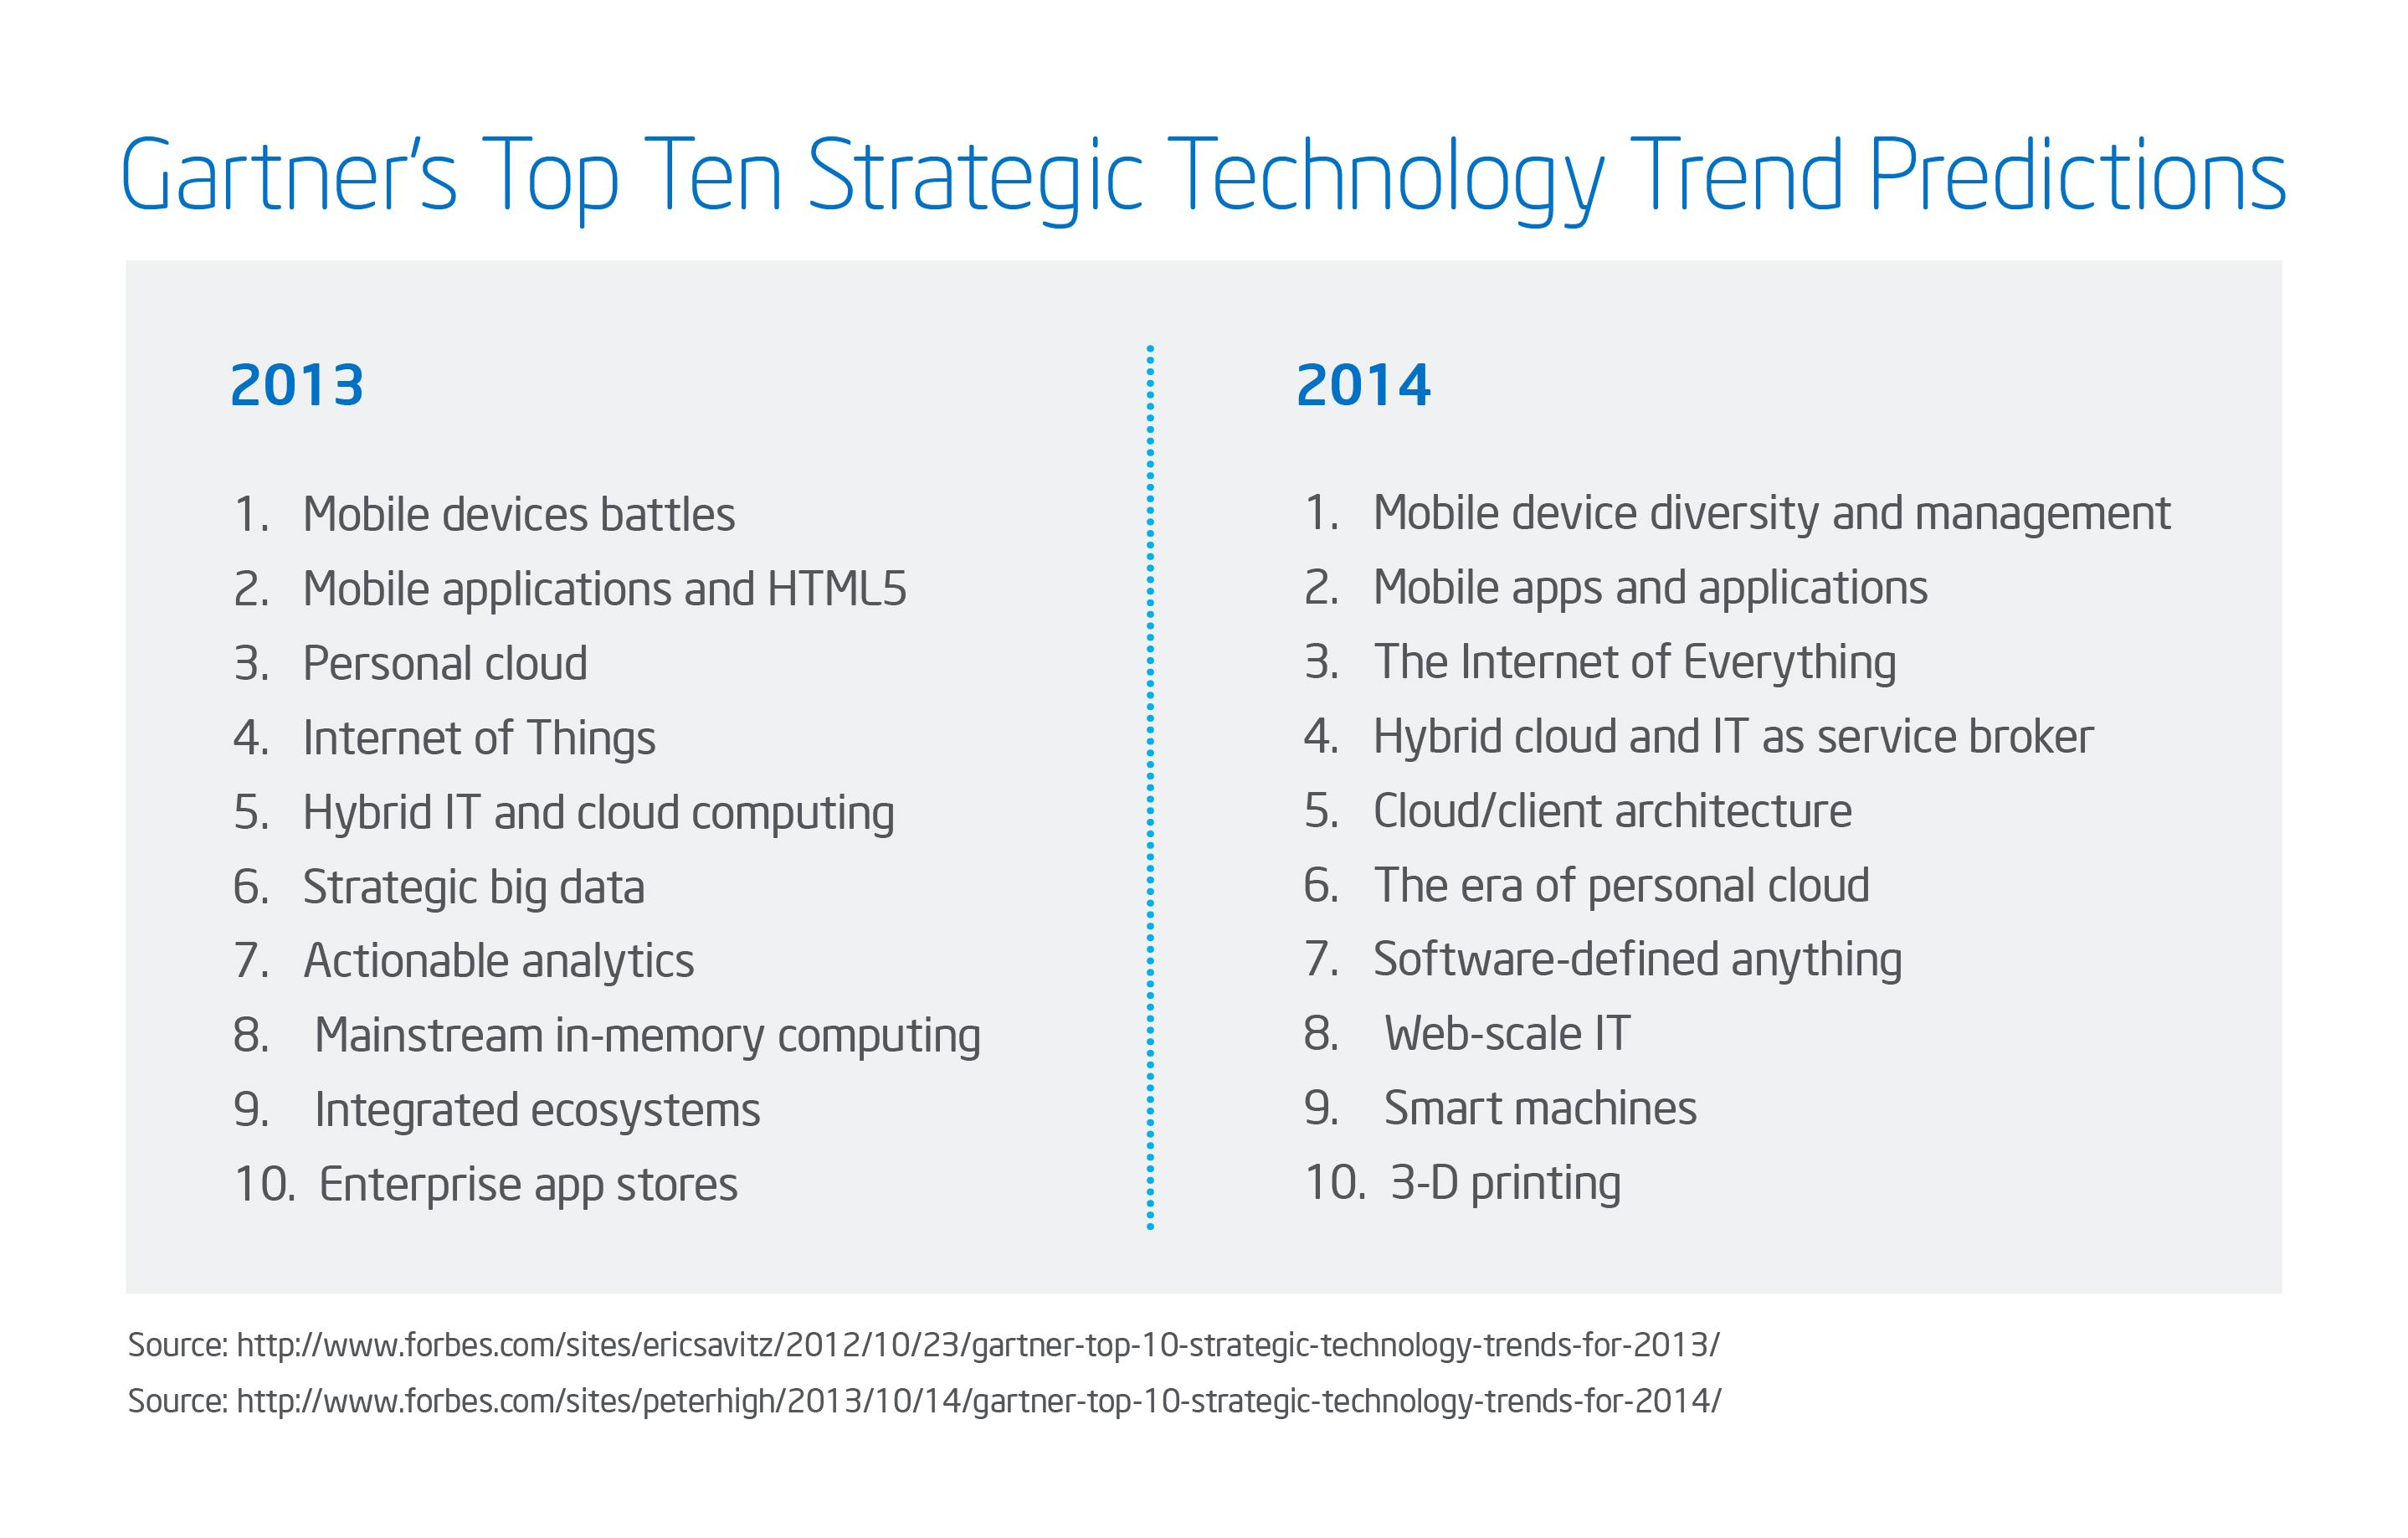 compare 2013 and 2014 top tech trends gartner.jpg